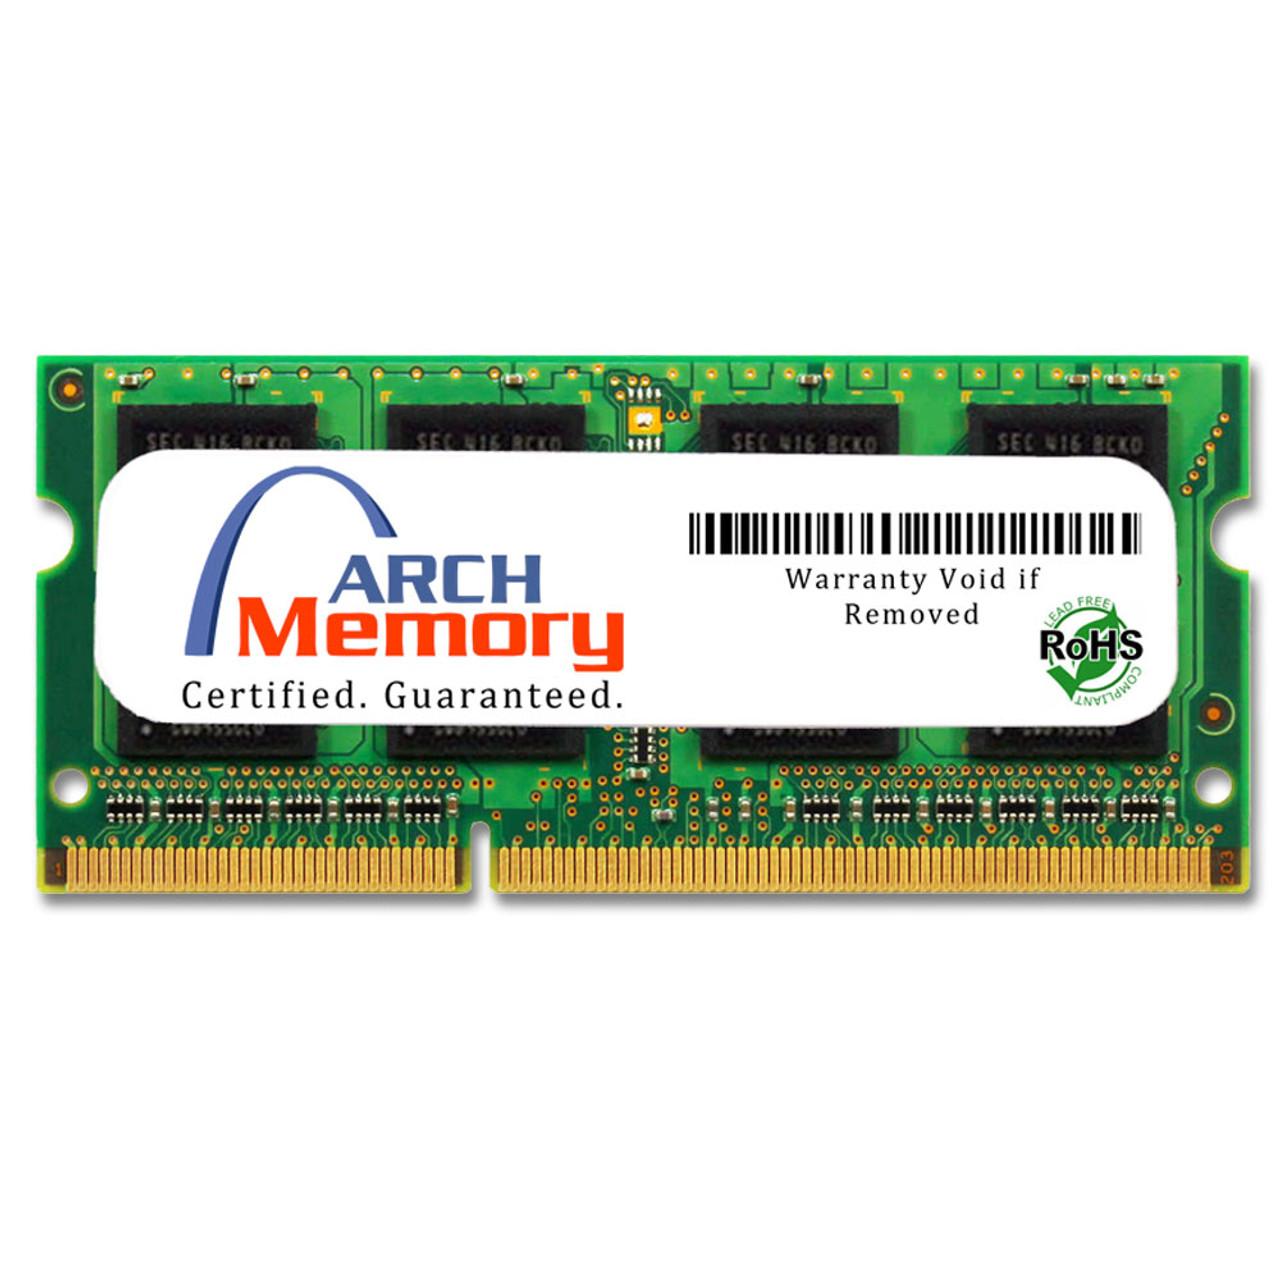 8GB 204-Pin DDR3-1333 PC3-10600 Sodimm (2Rx8) RAM | Arch Memory